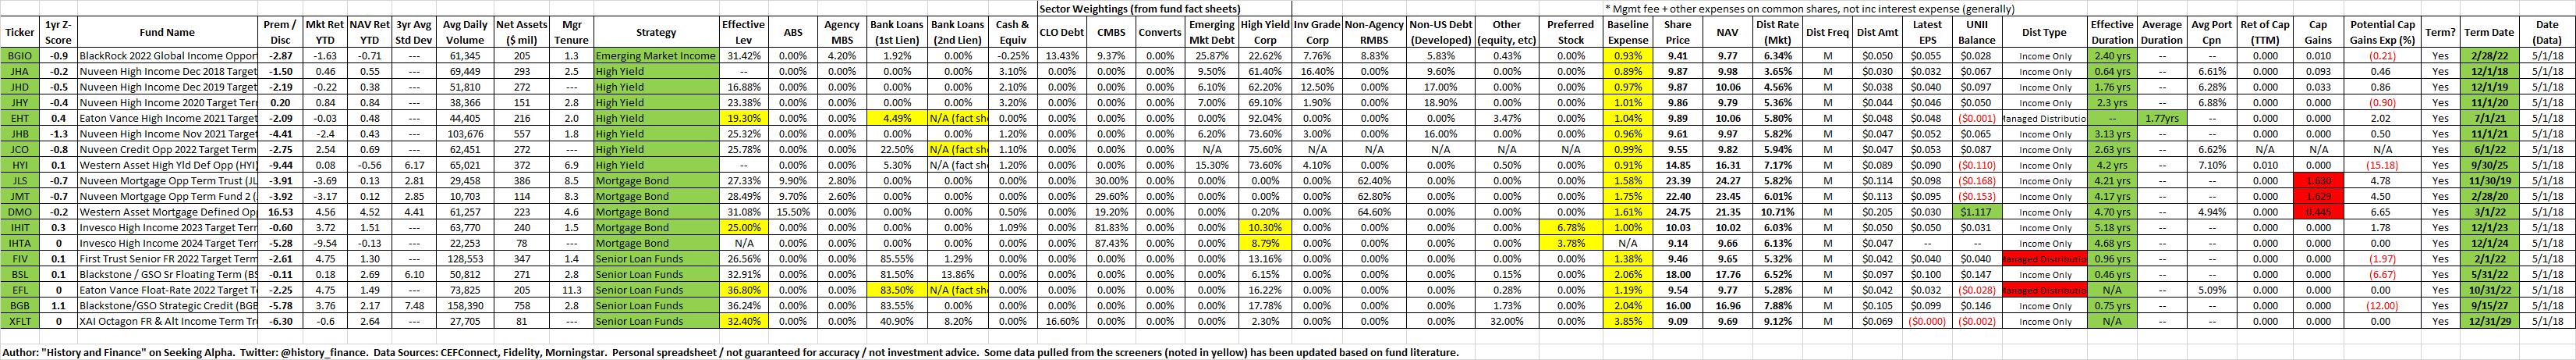 Bond Ladder Spreadsheet Inside Term Cef Ladder #4: Highyield Bond Closedend Funds  Eaton Vance